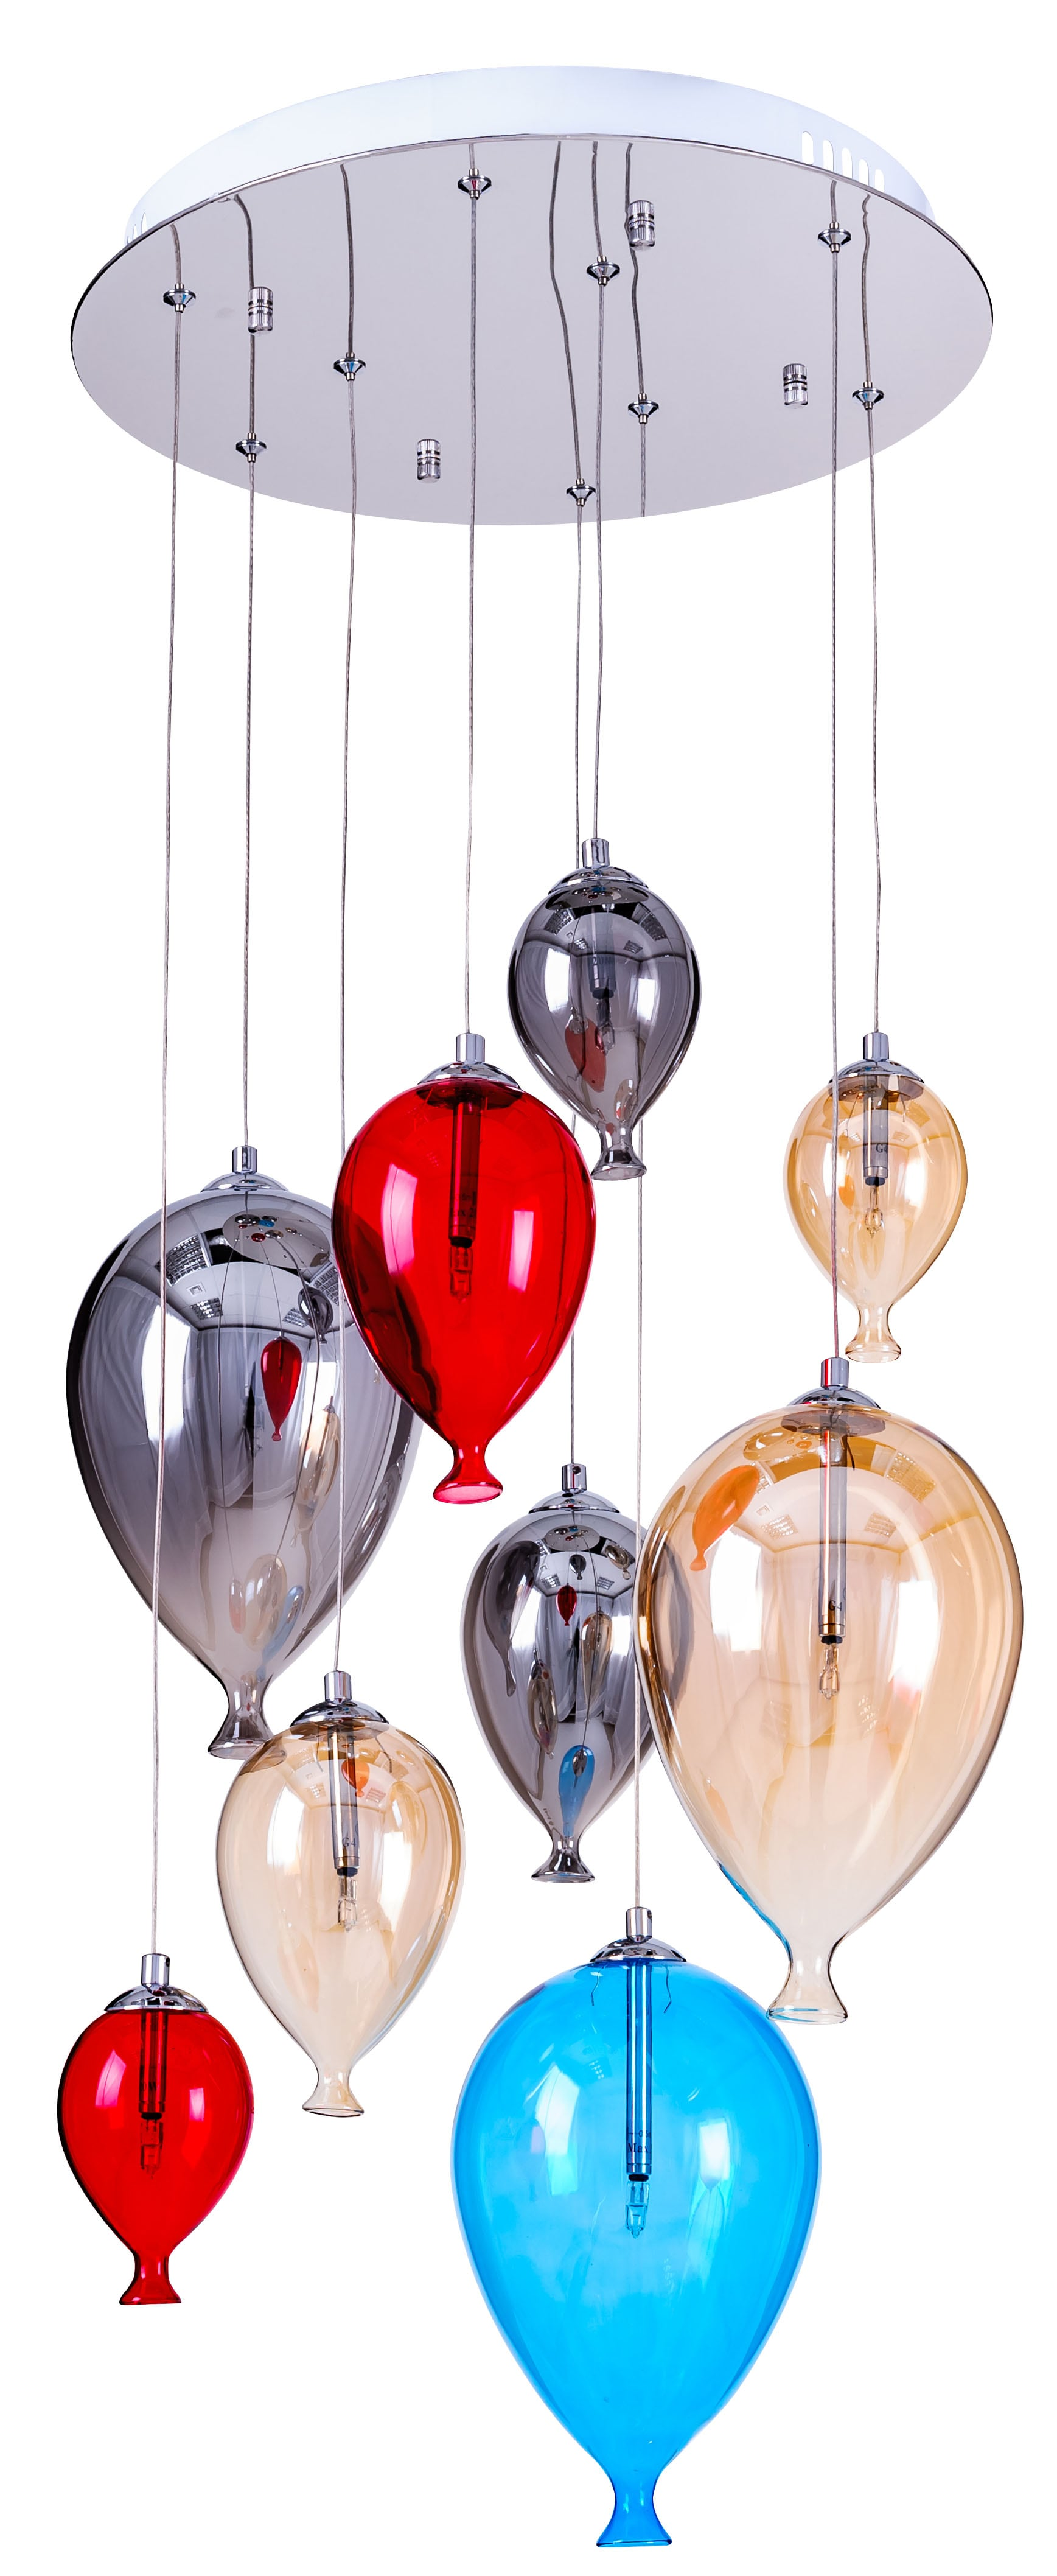 lamp children's hanging balloons - Balloon multicolor 160cm / 40cm 9xG4 20W